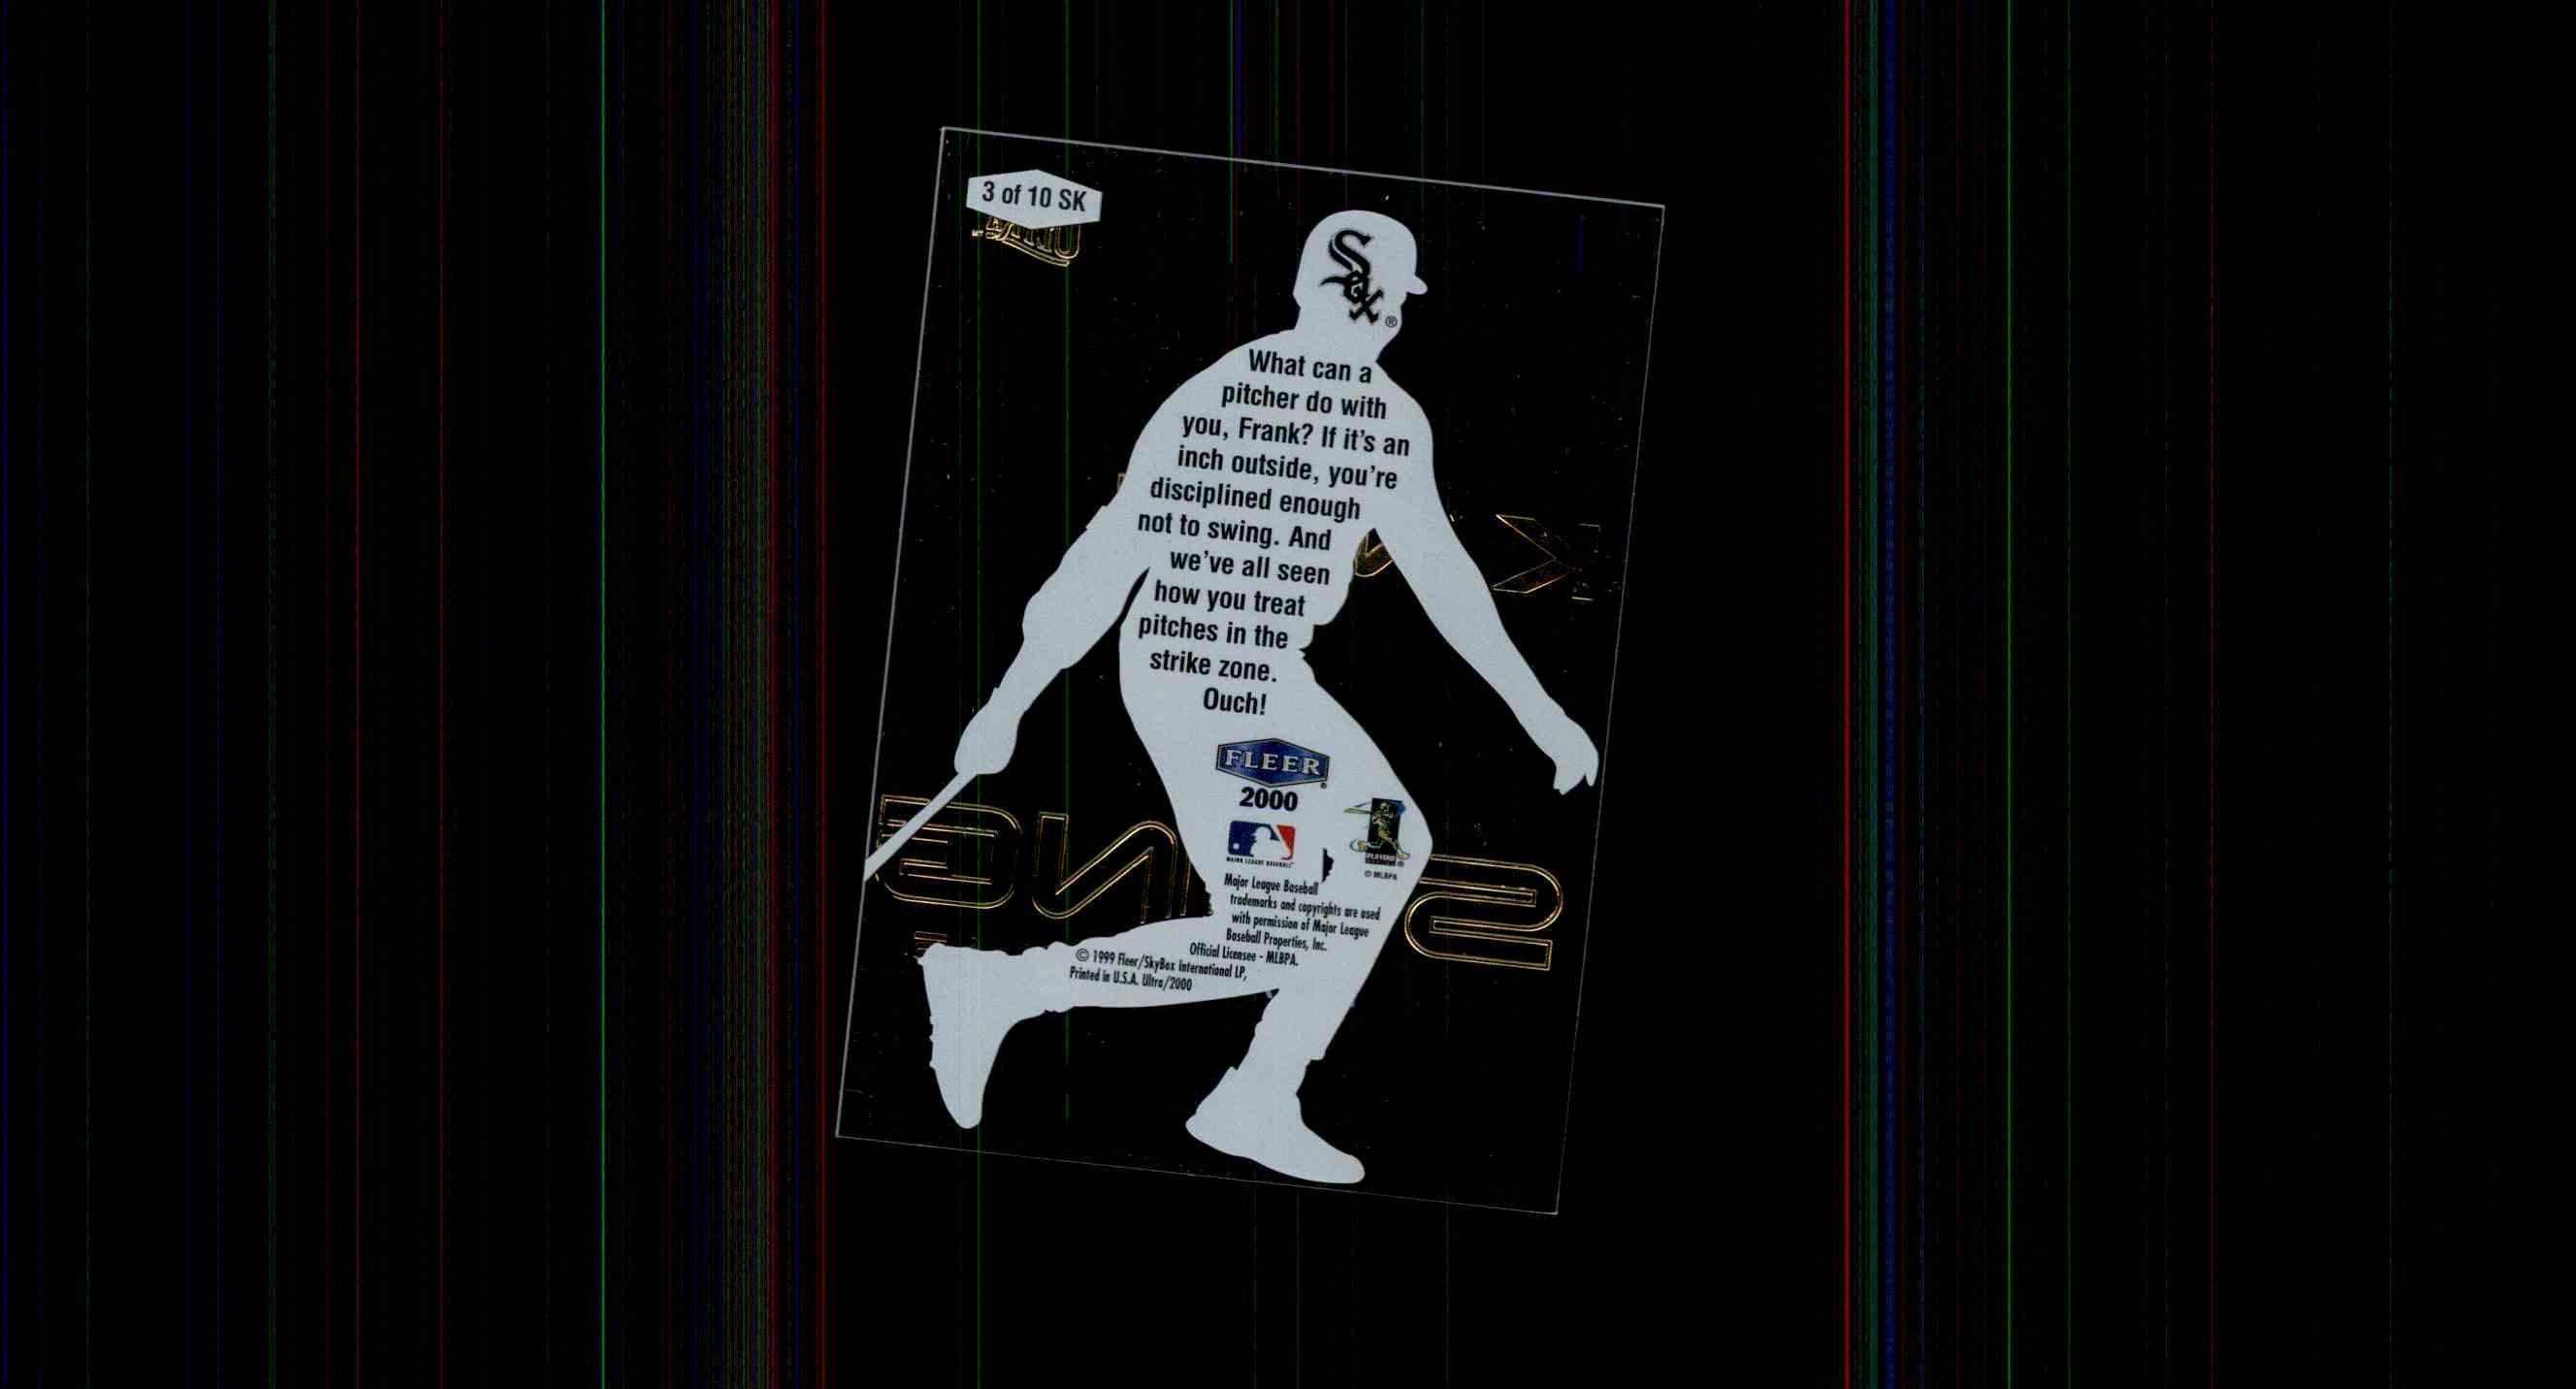 2000 Ultra Swing King Frank Thomas 3 On Kronozio